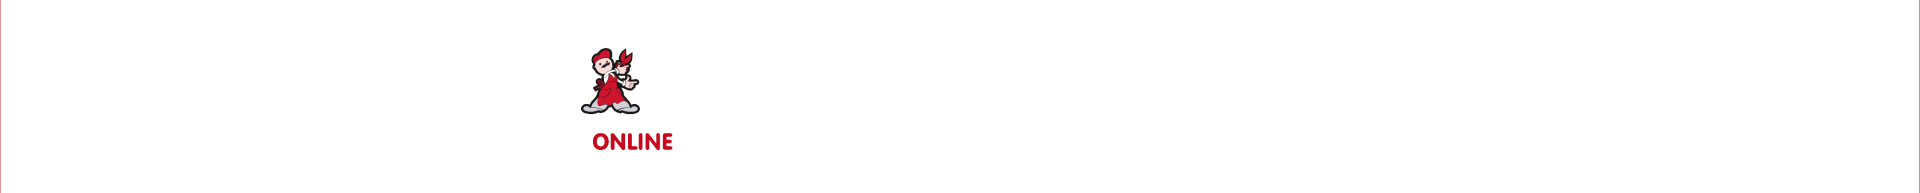 Лого Мульти-мастер Онлайн 2